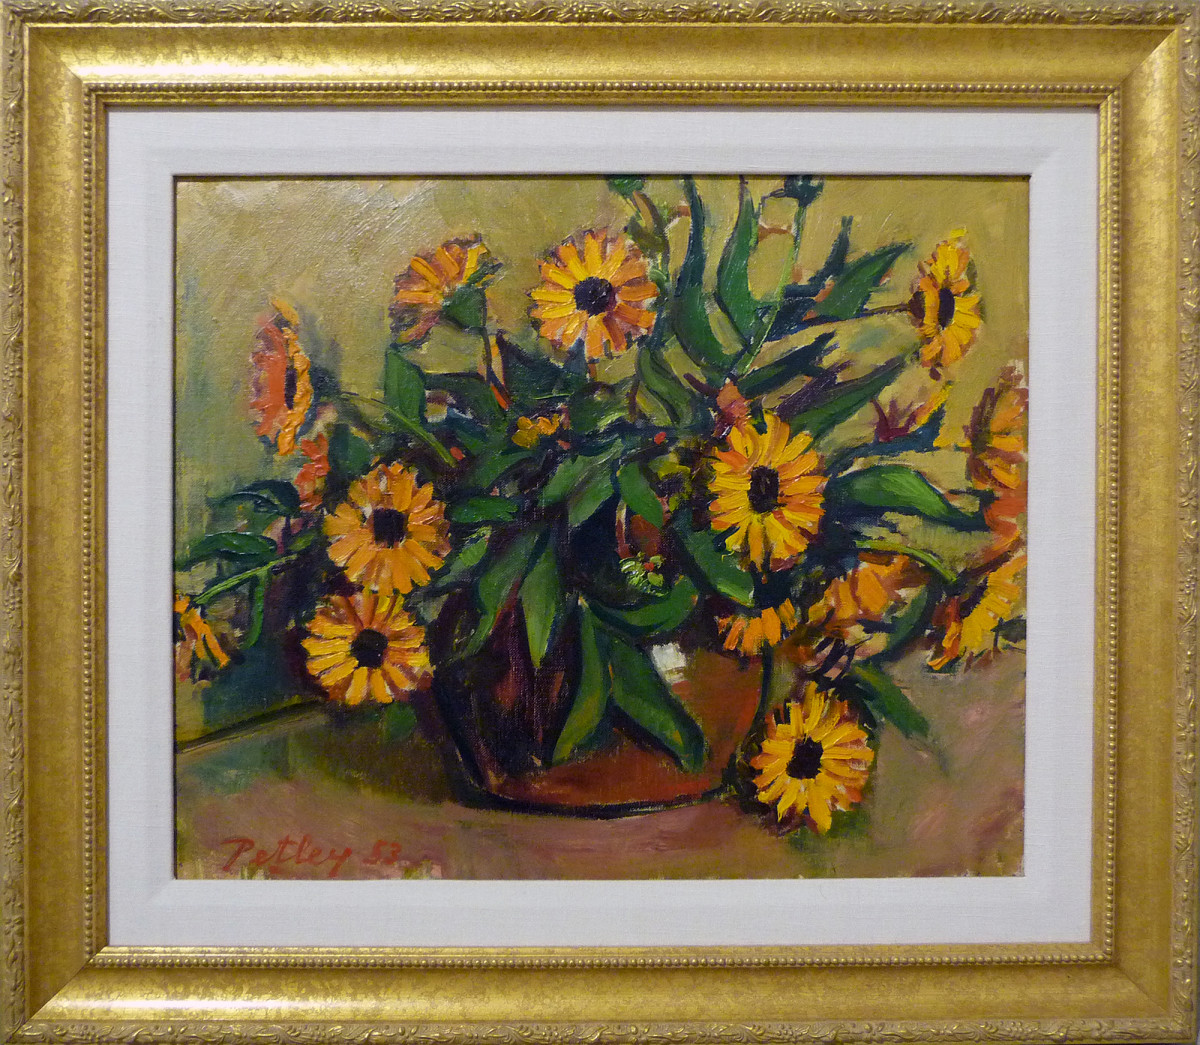 0227 - Marigolds by Llewellyn Petley-Jones (1908-1986)